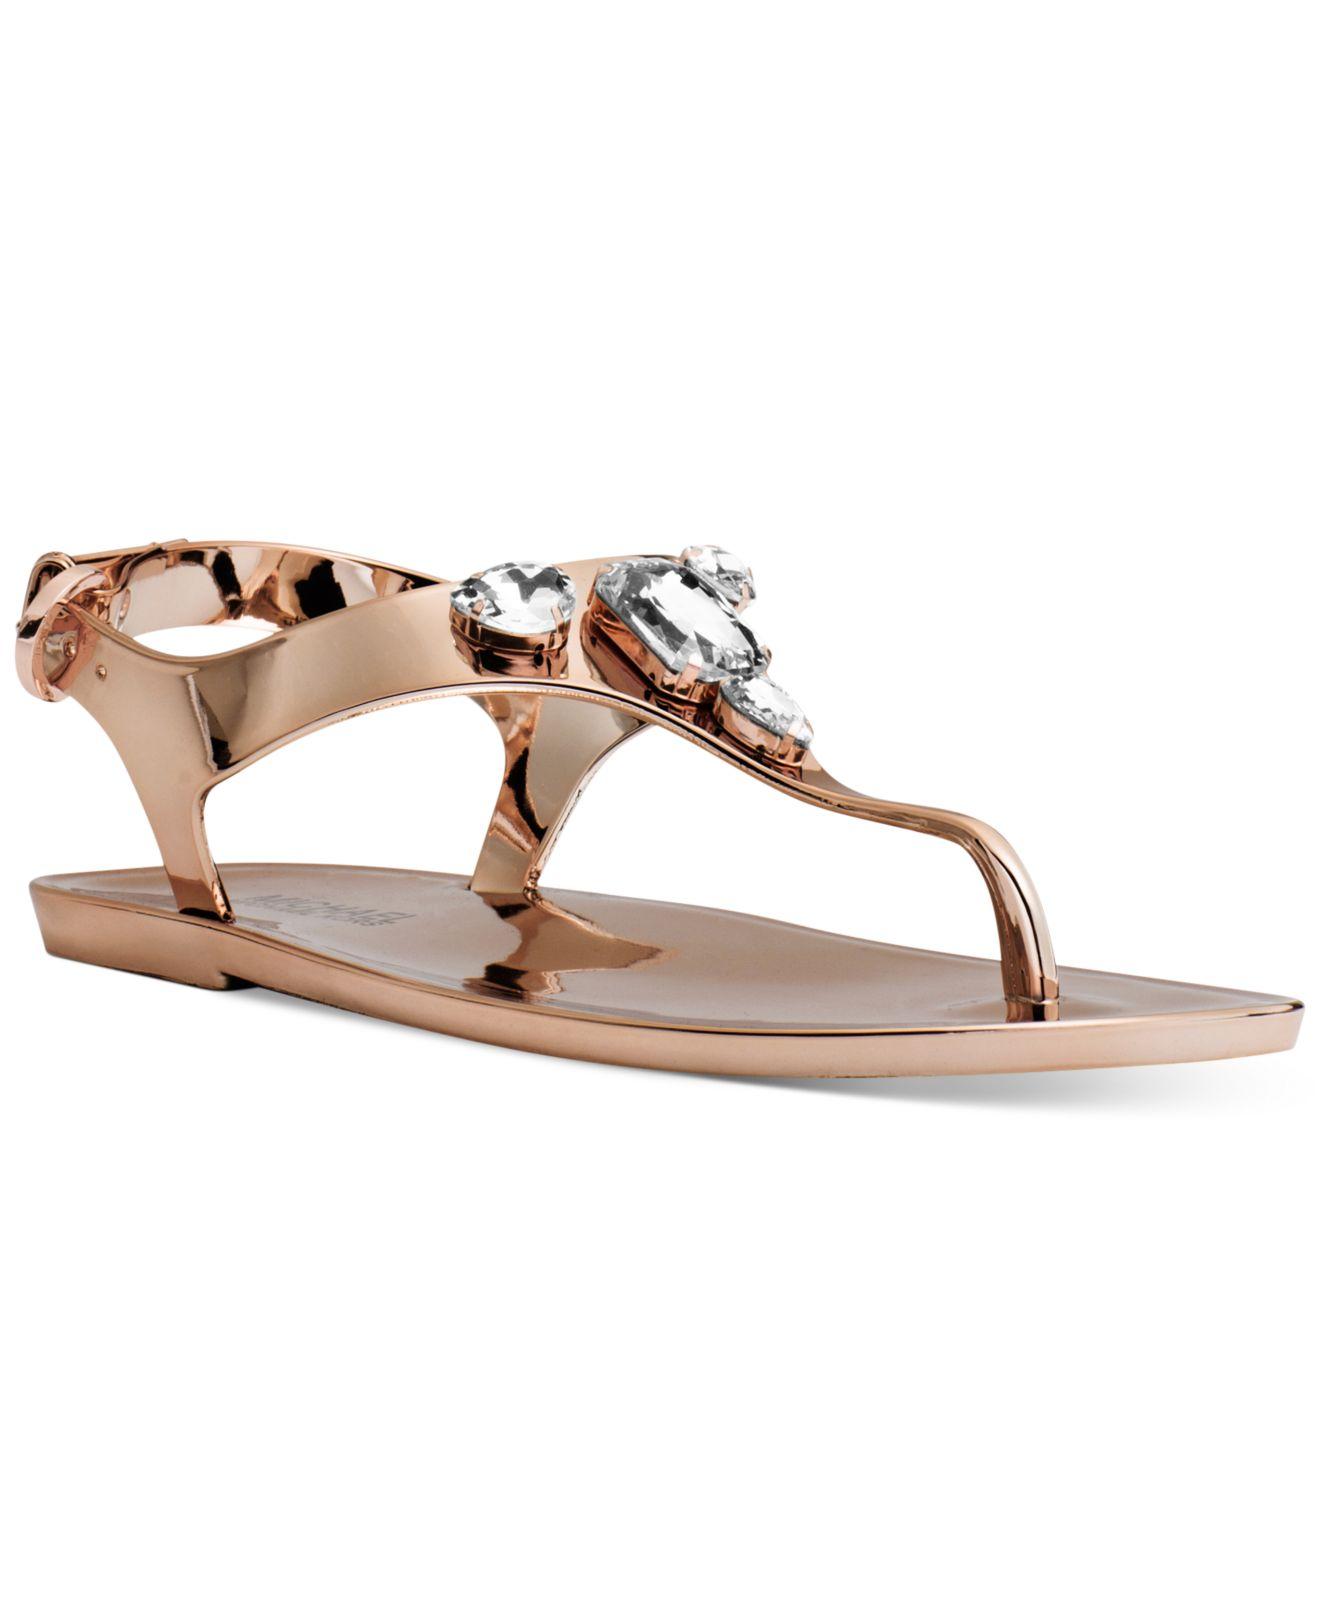 537d8d62162 Lyst - Michael Kors Michael Jayden Jeweled Jelly Flat Thong Sandals ...